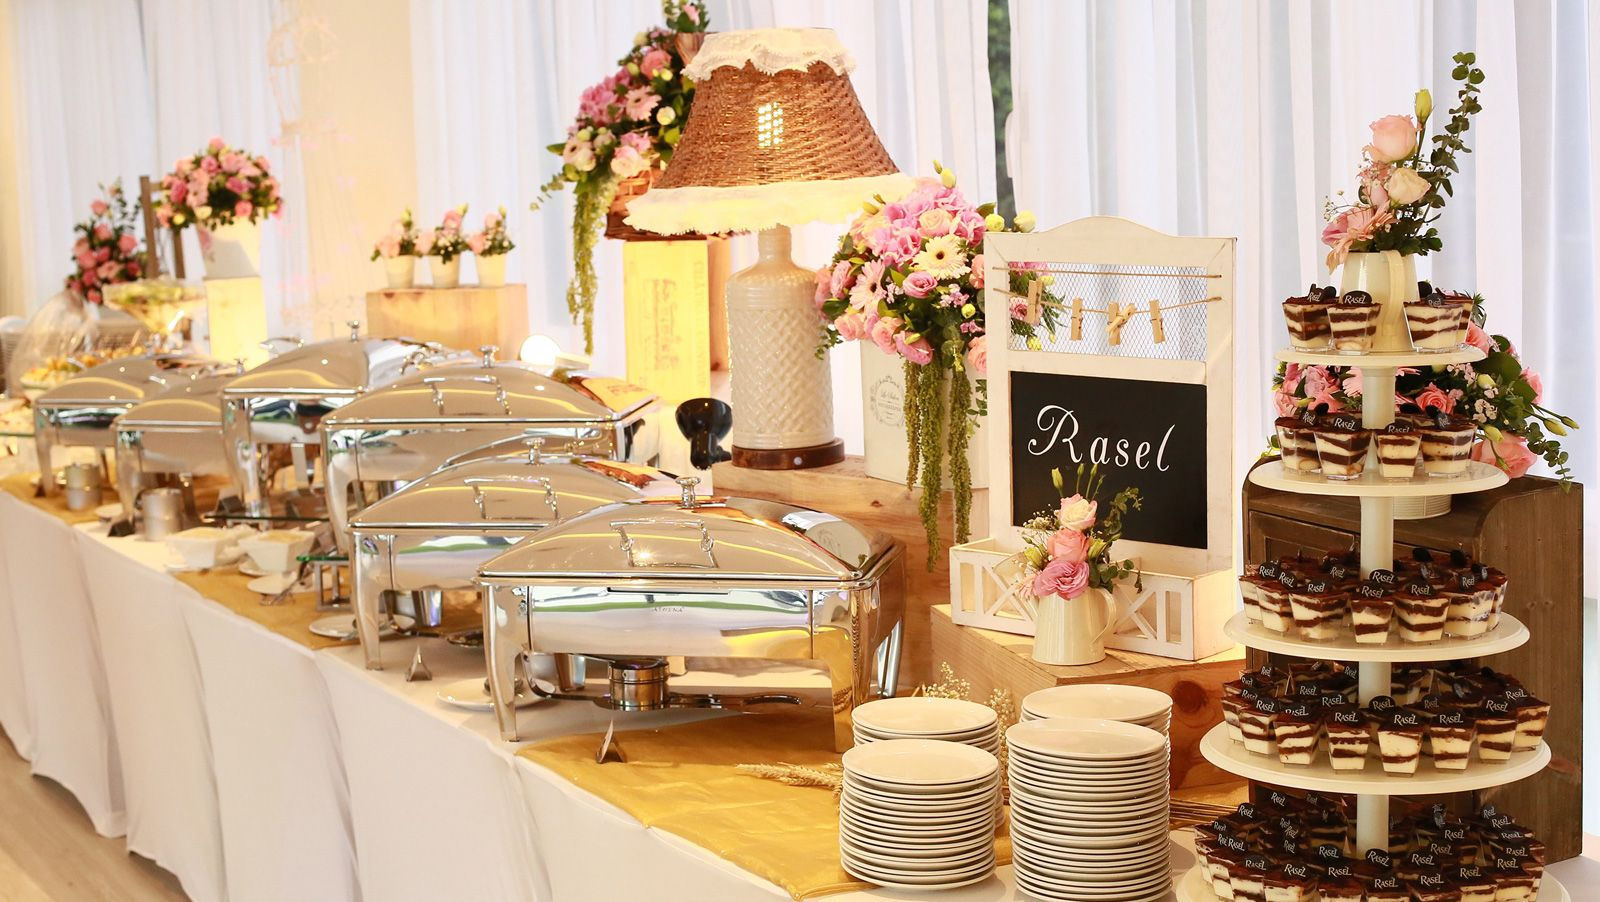 Donate leftover wedding food